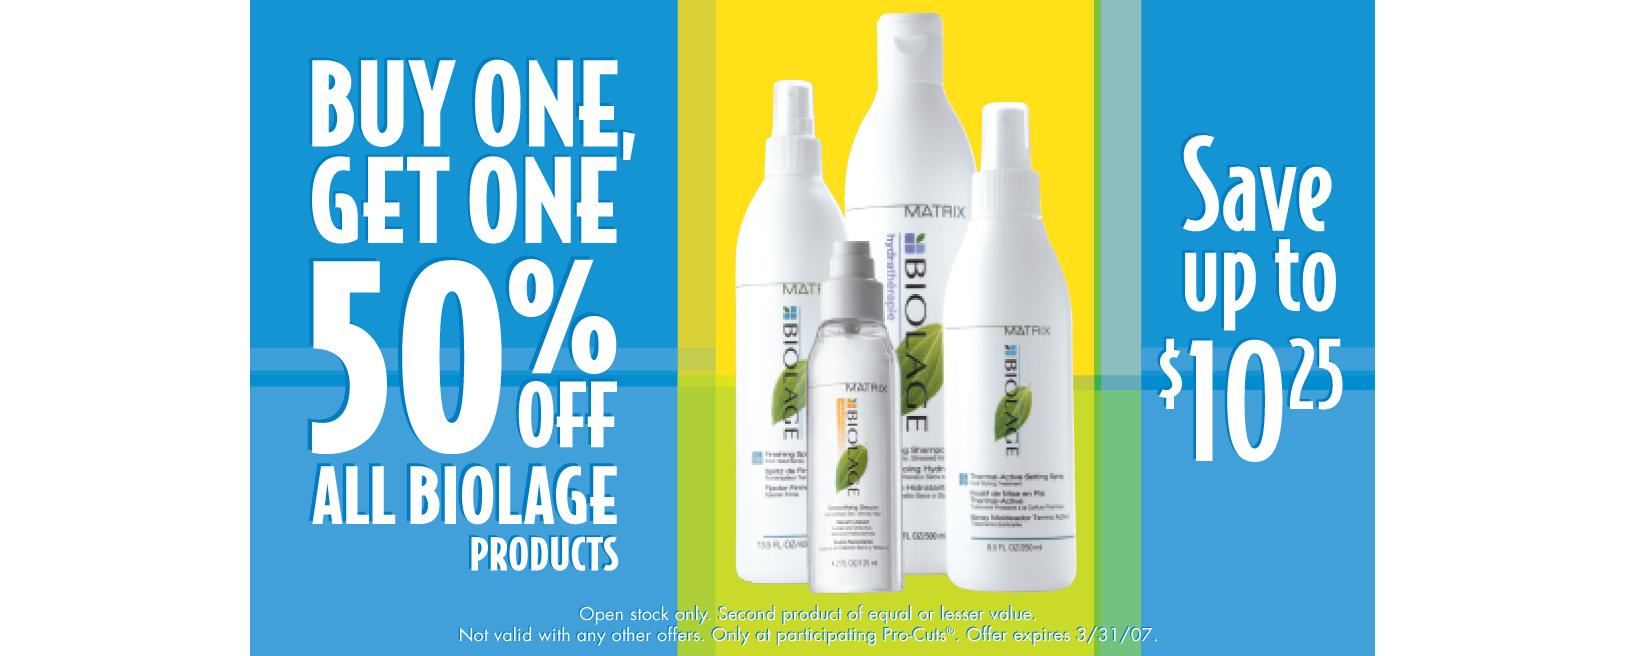 Retail Signage - ProCuts / Biolage